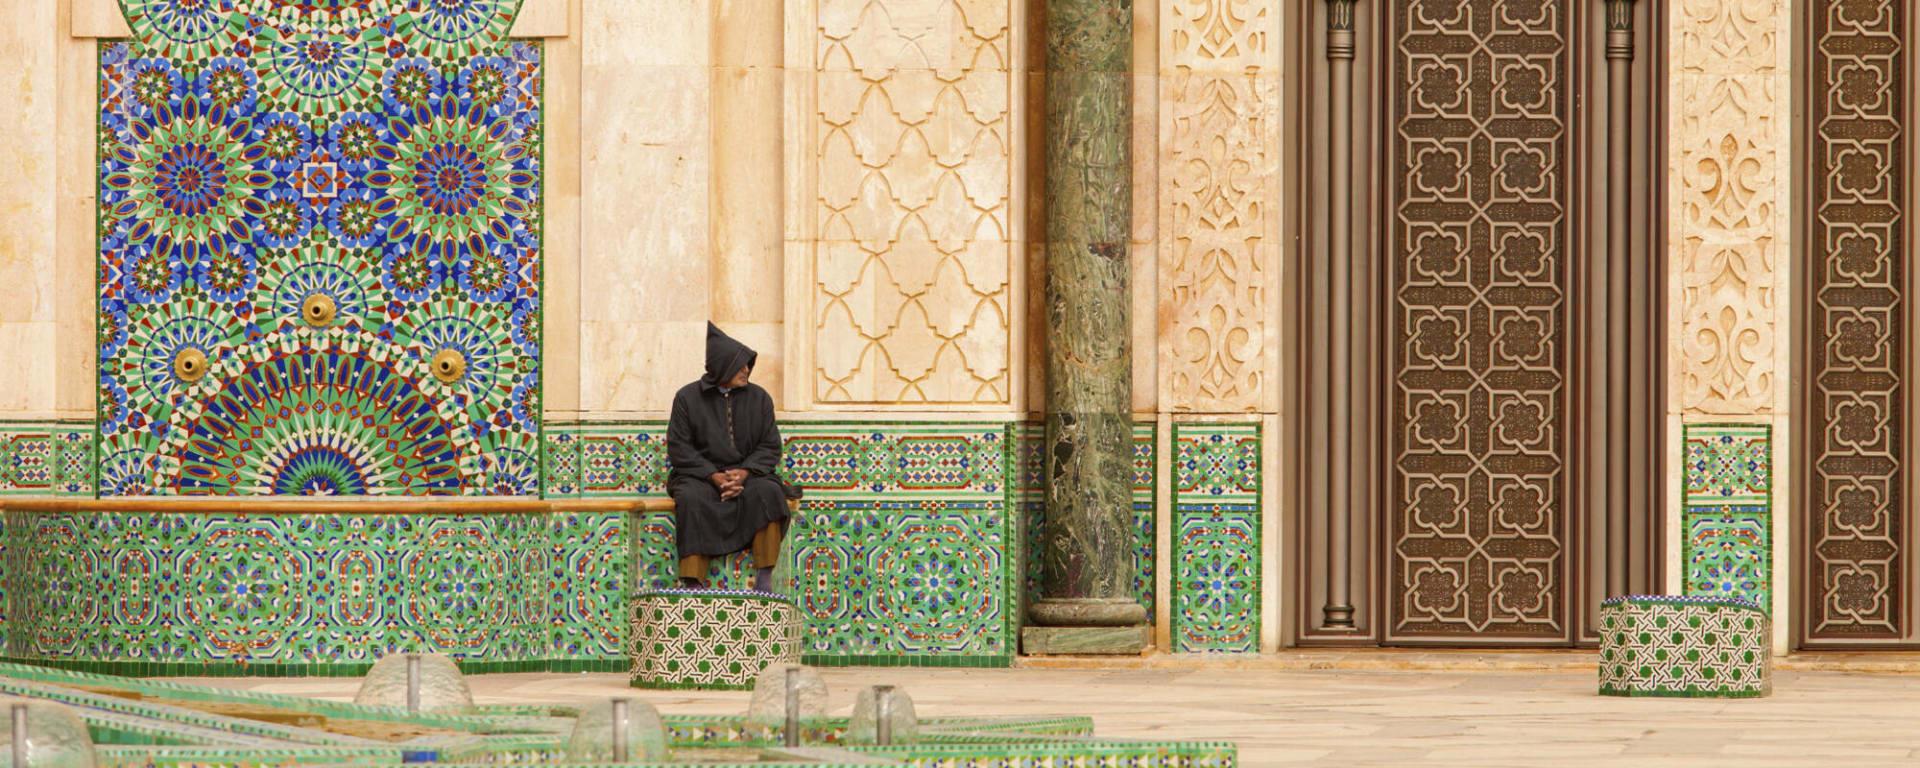 Höhepunkte Marokkos ab Casablanca: Casablanca Hassan II Moschee